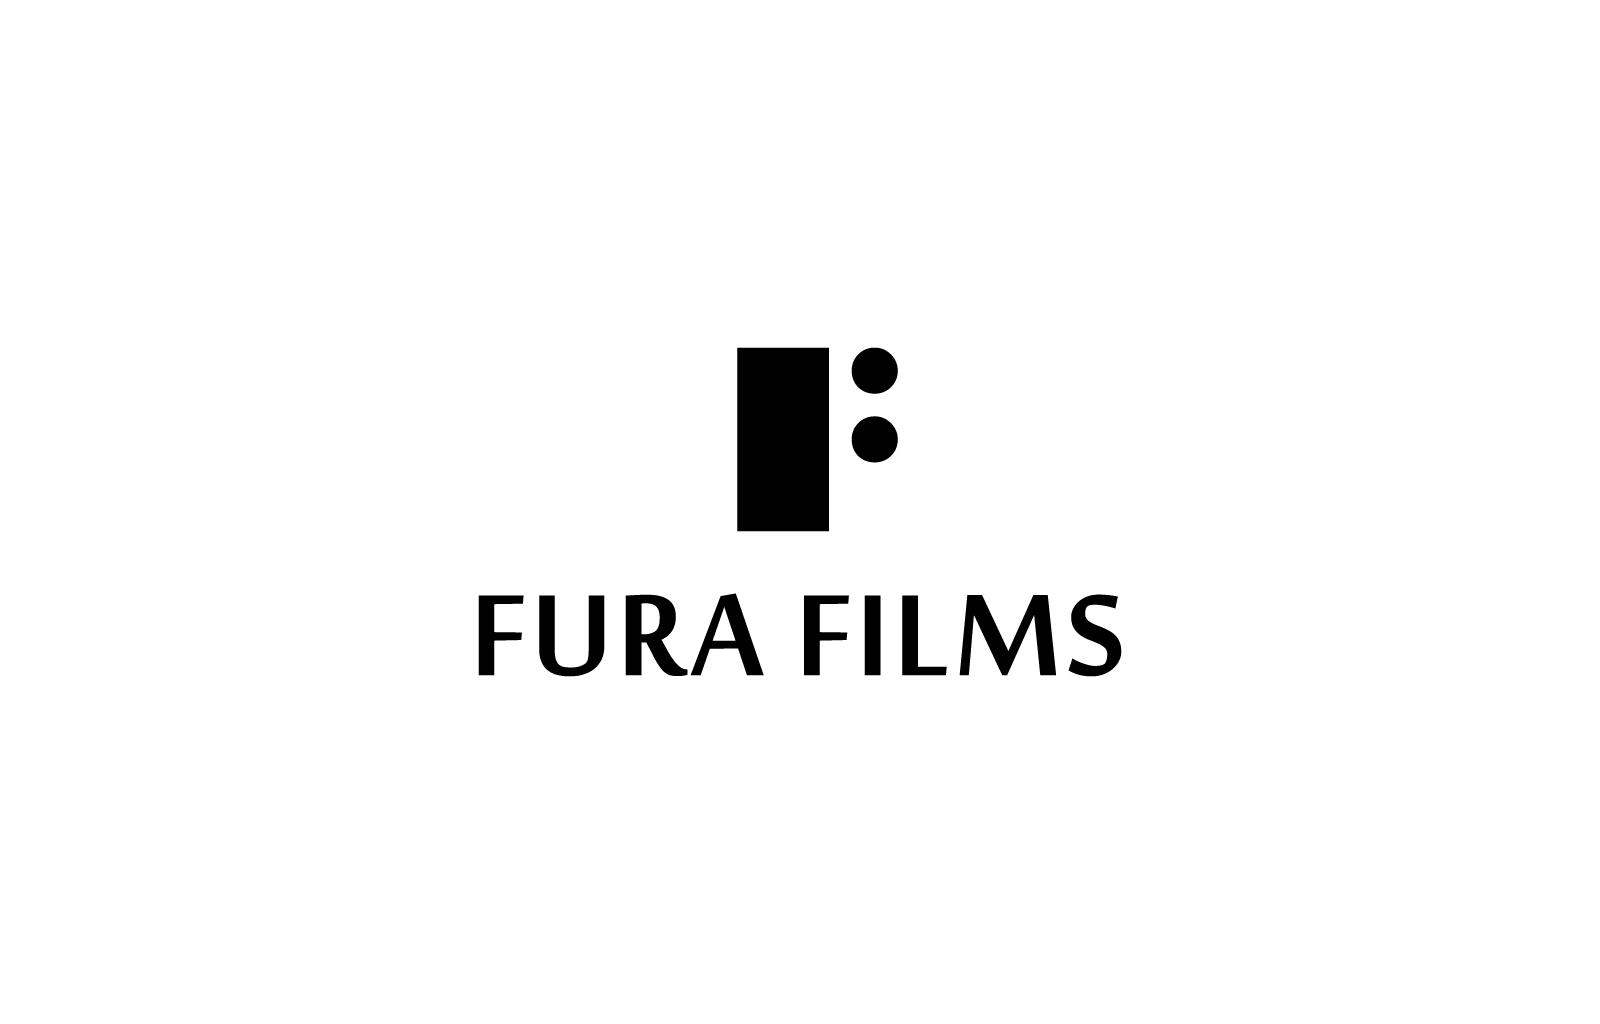 Fura Films